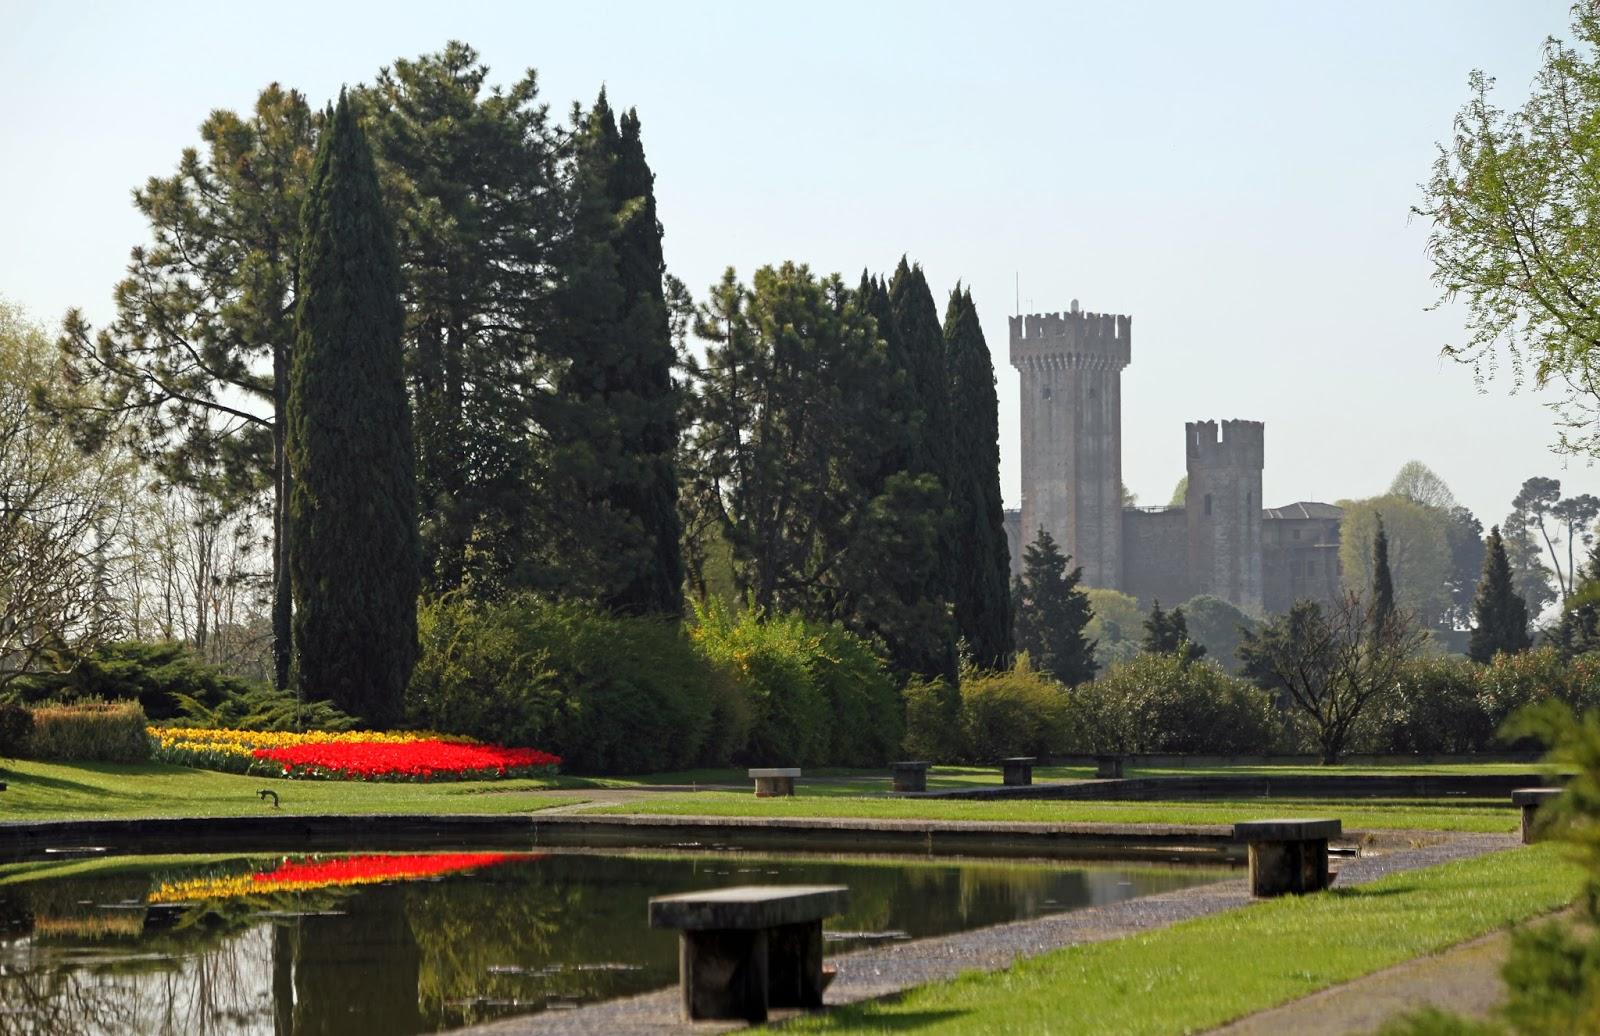 Discover north east italy for free october 2013 - Parco giardino sigurta valeggio sul mincio vr ...